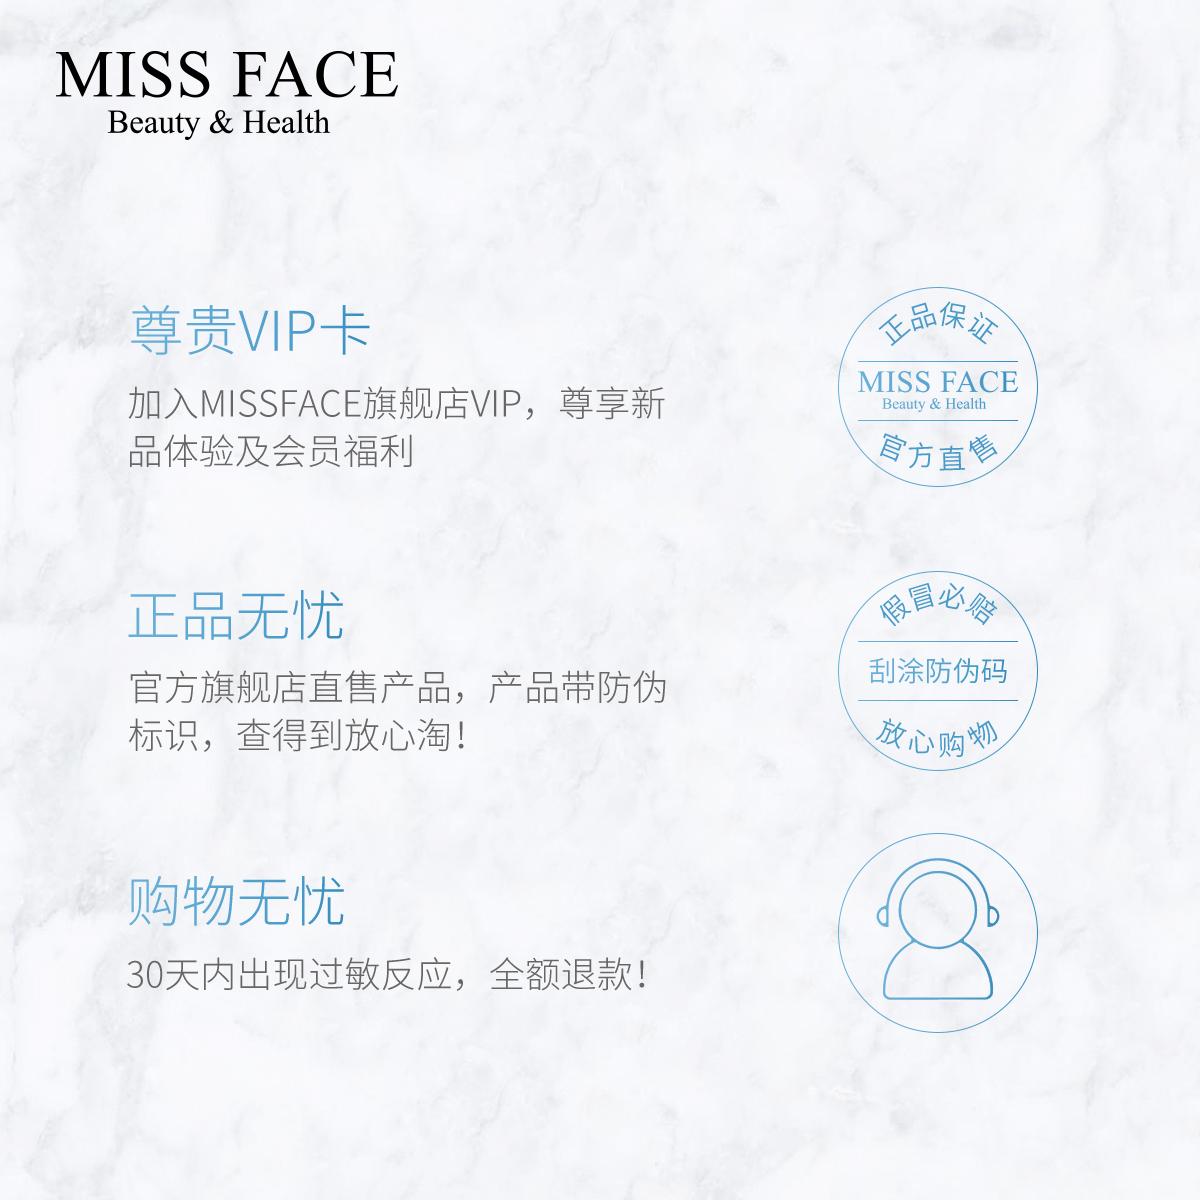 Miss 玻尿酸补水面膜抗皱六胜肽面膜烟酰胺亮肤收缩毛孔正品  face